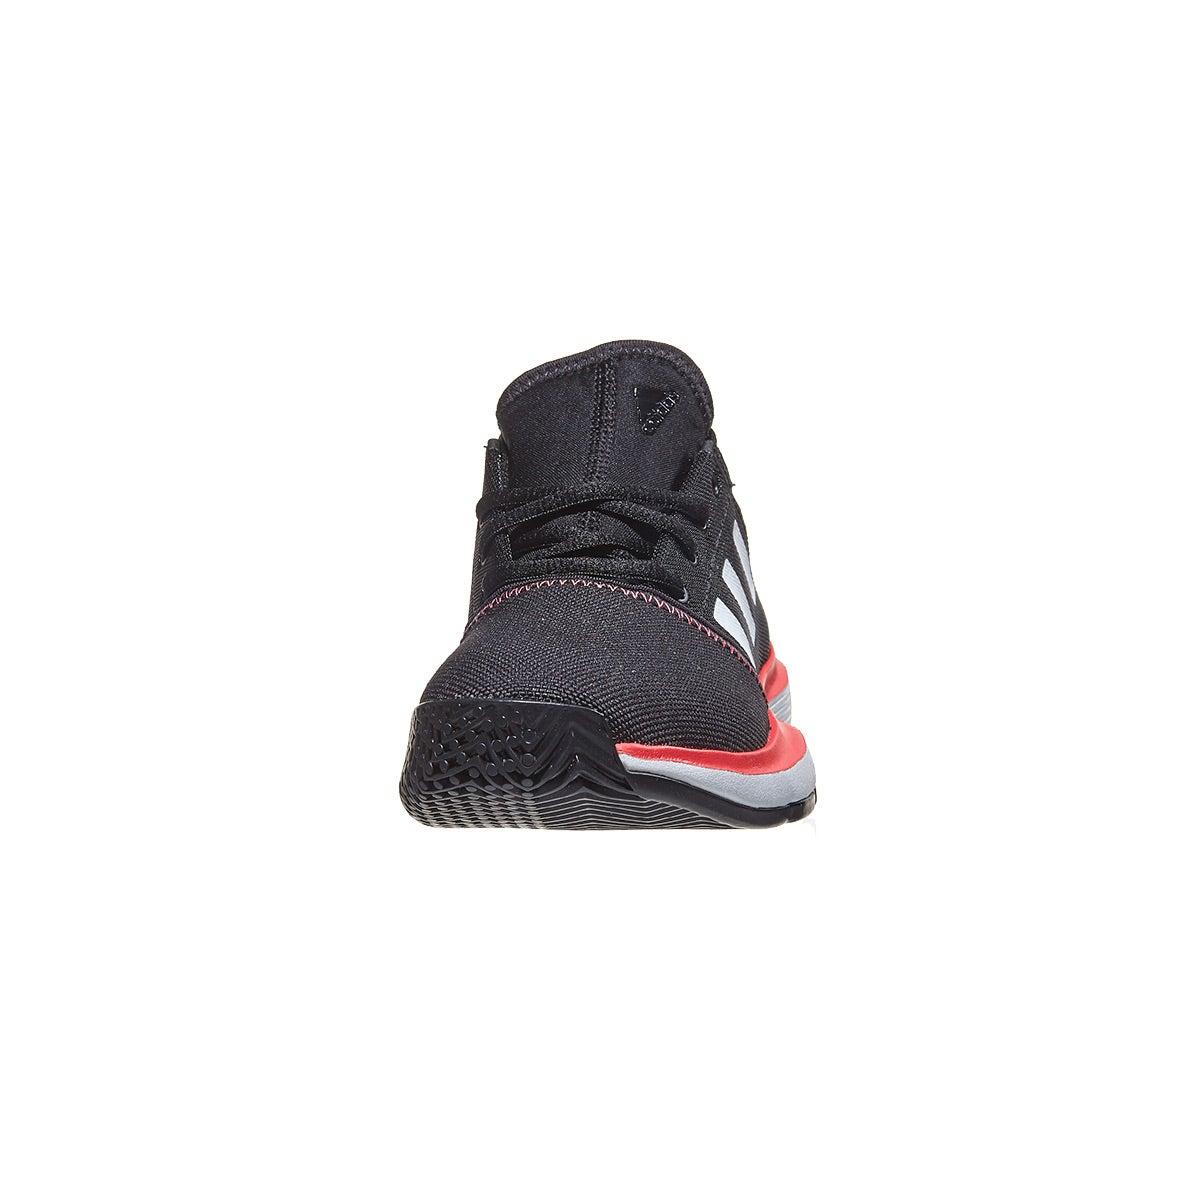 18909deaa80 adidas SoleCourt xJ Black/Red Junior Shoes 360° View